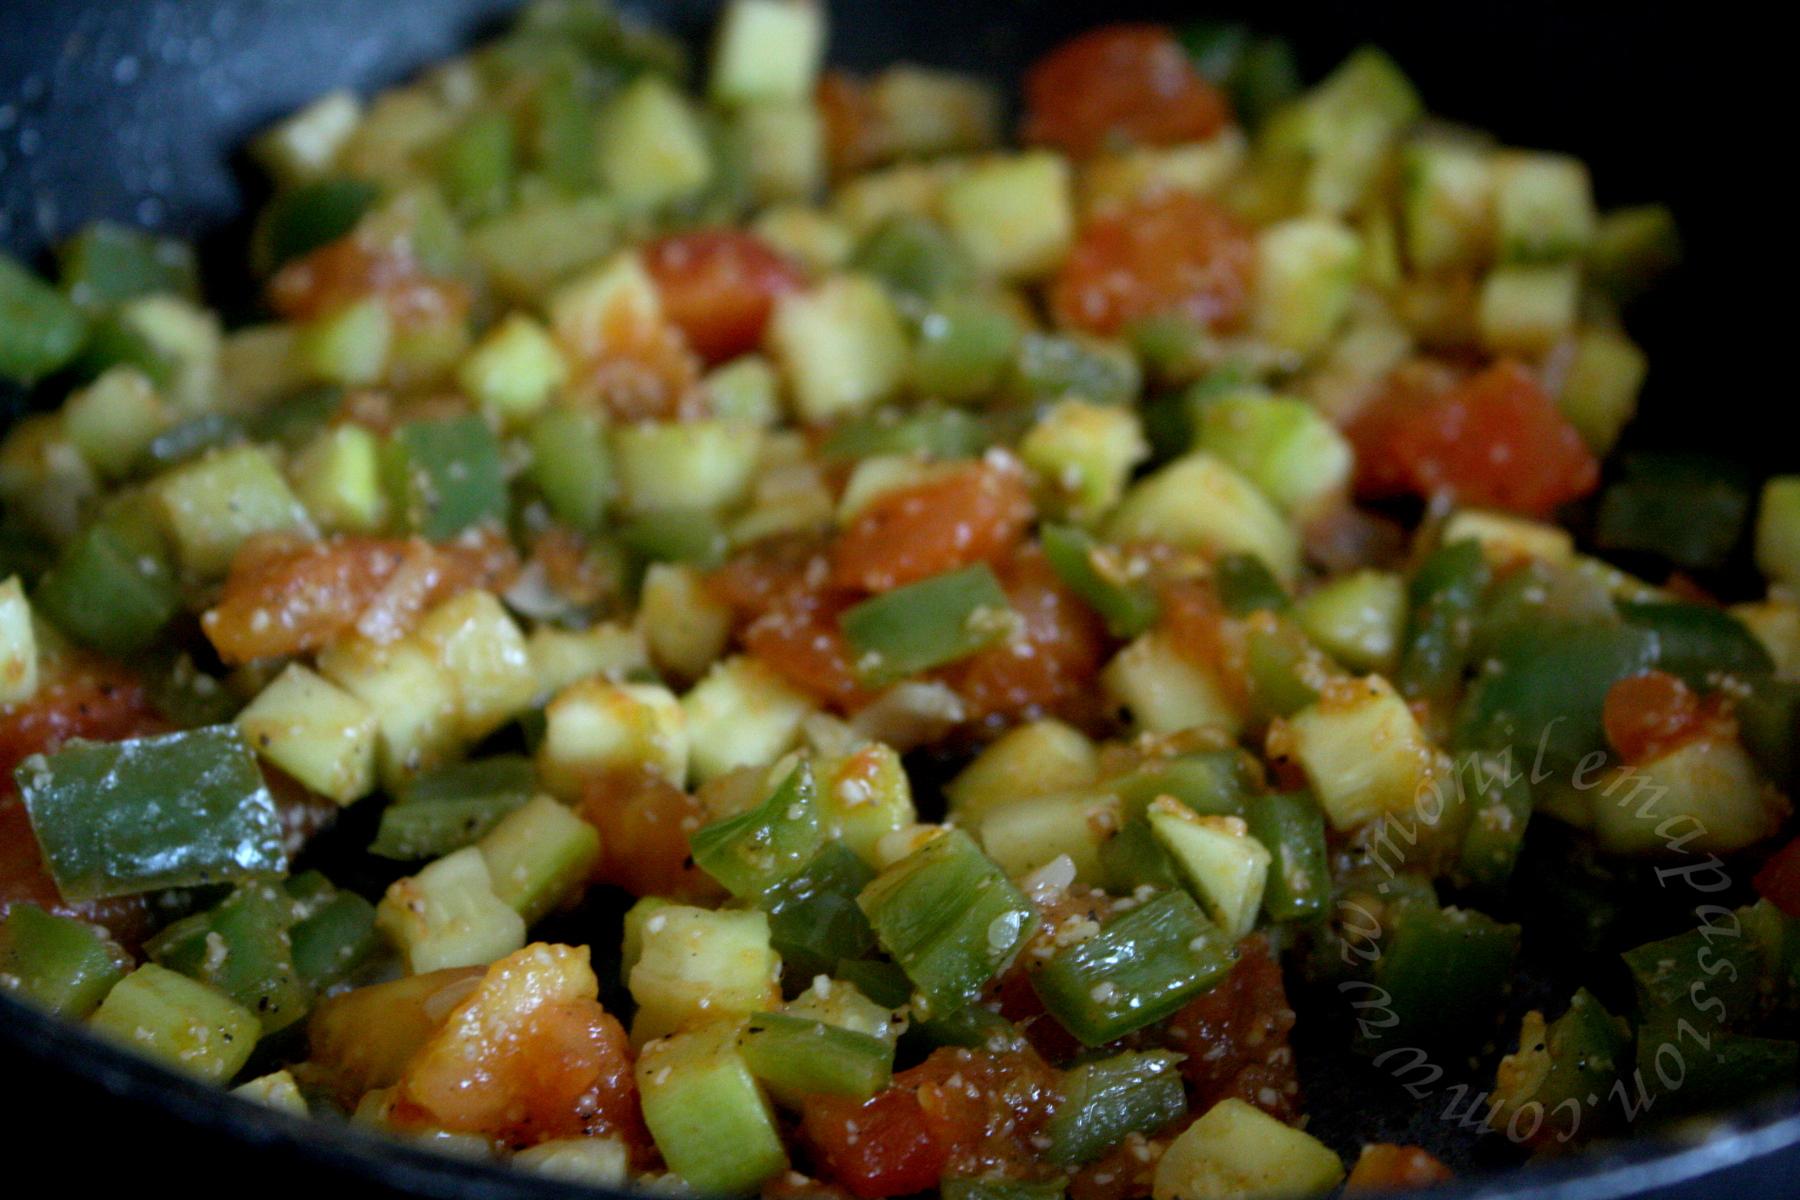 Cake légumes, gros piments et jambon blanc de volaille – Green Sweet Chili Pepper, Chicken Ham & Veggie Cake